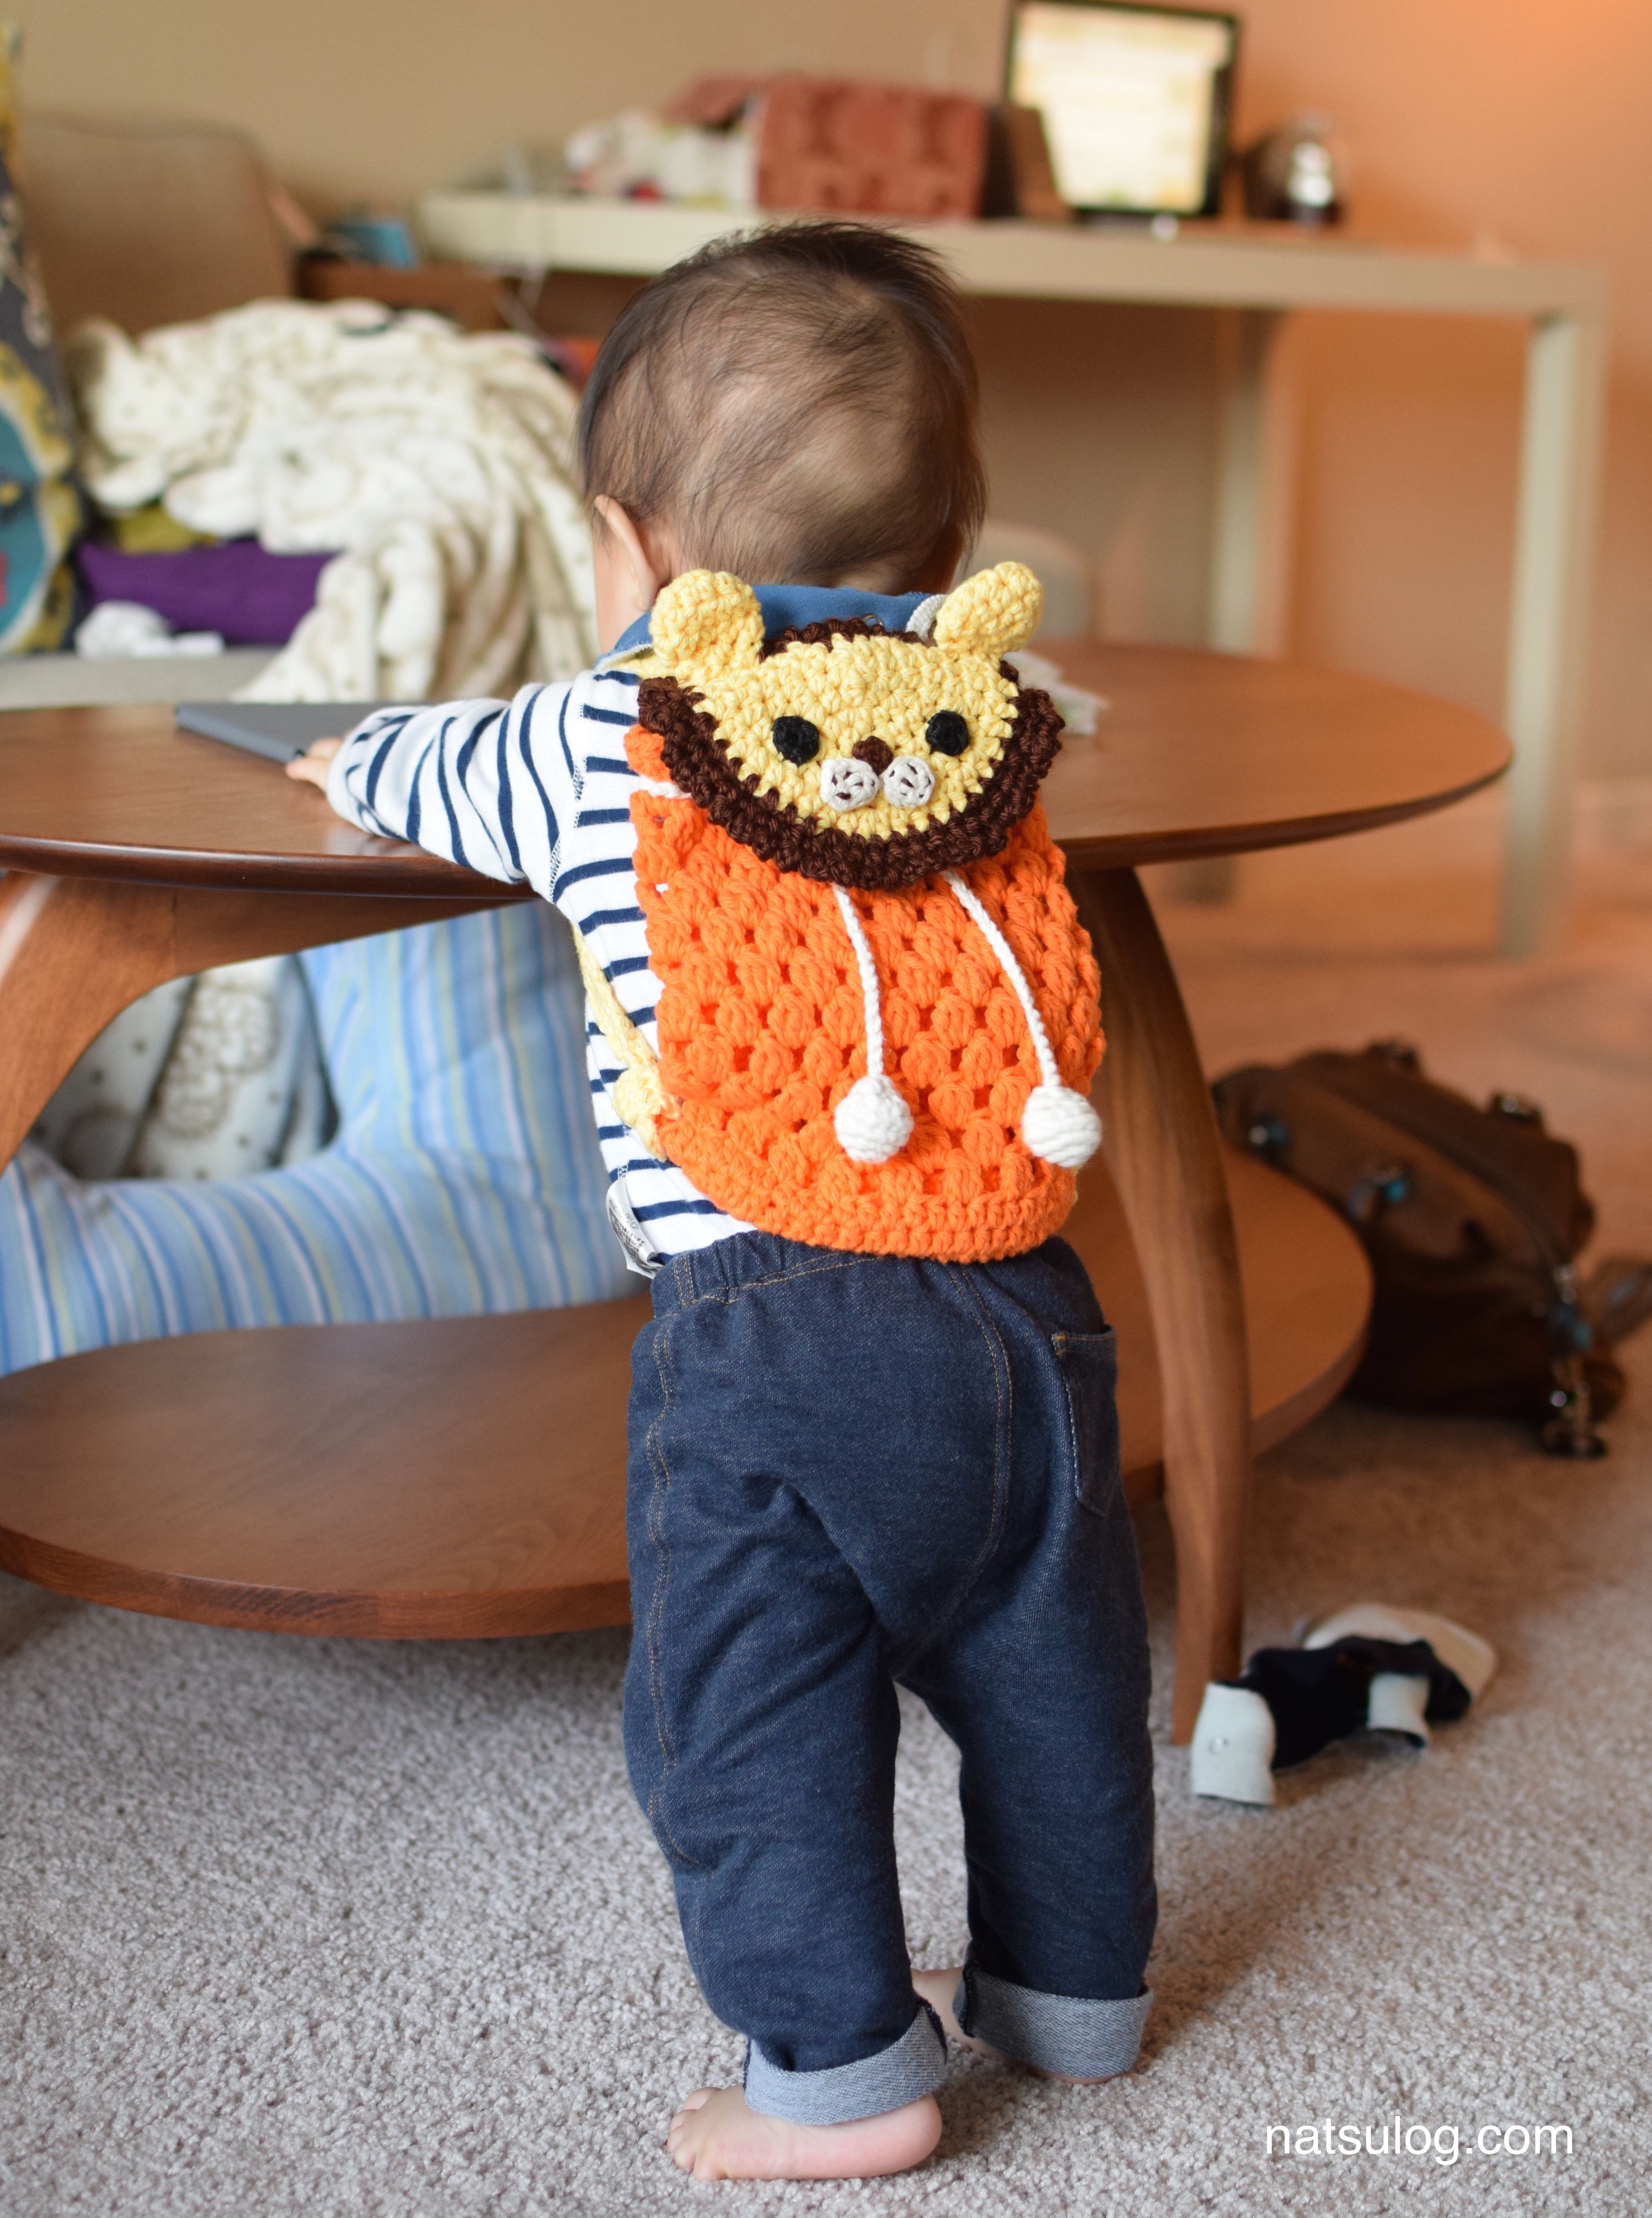 Crochet Lion Backpack for babies and kids - Crochet backpack pattern ...